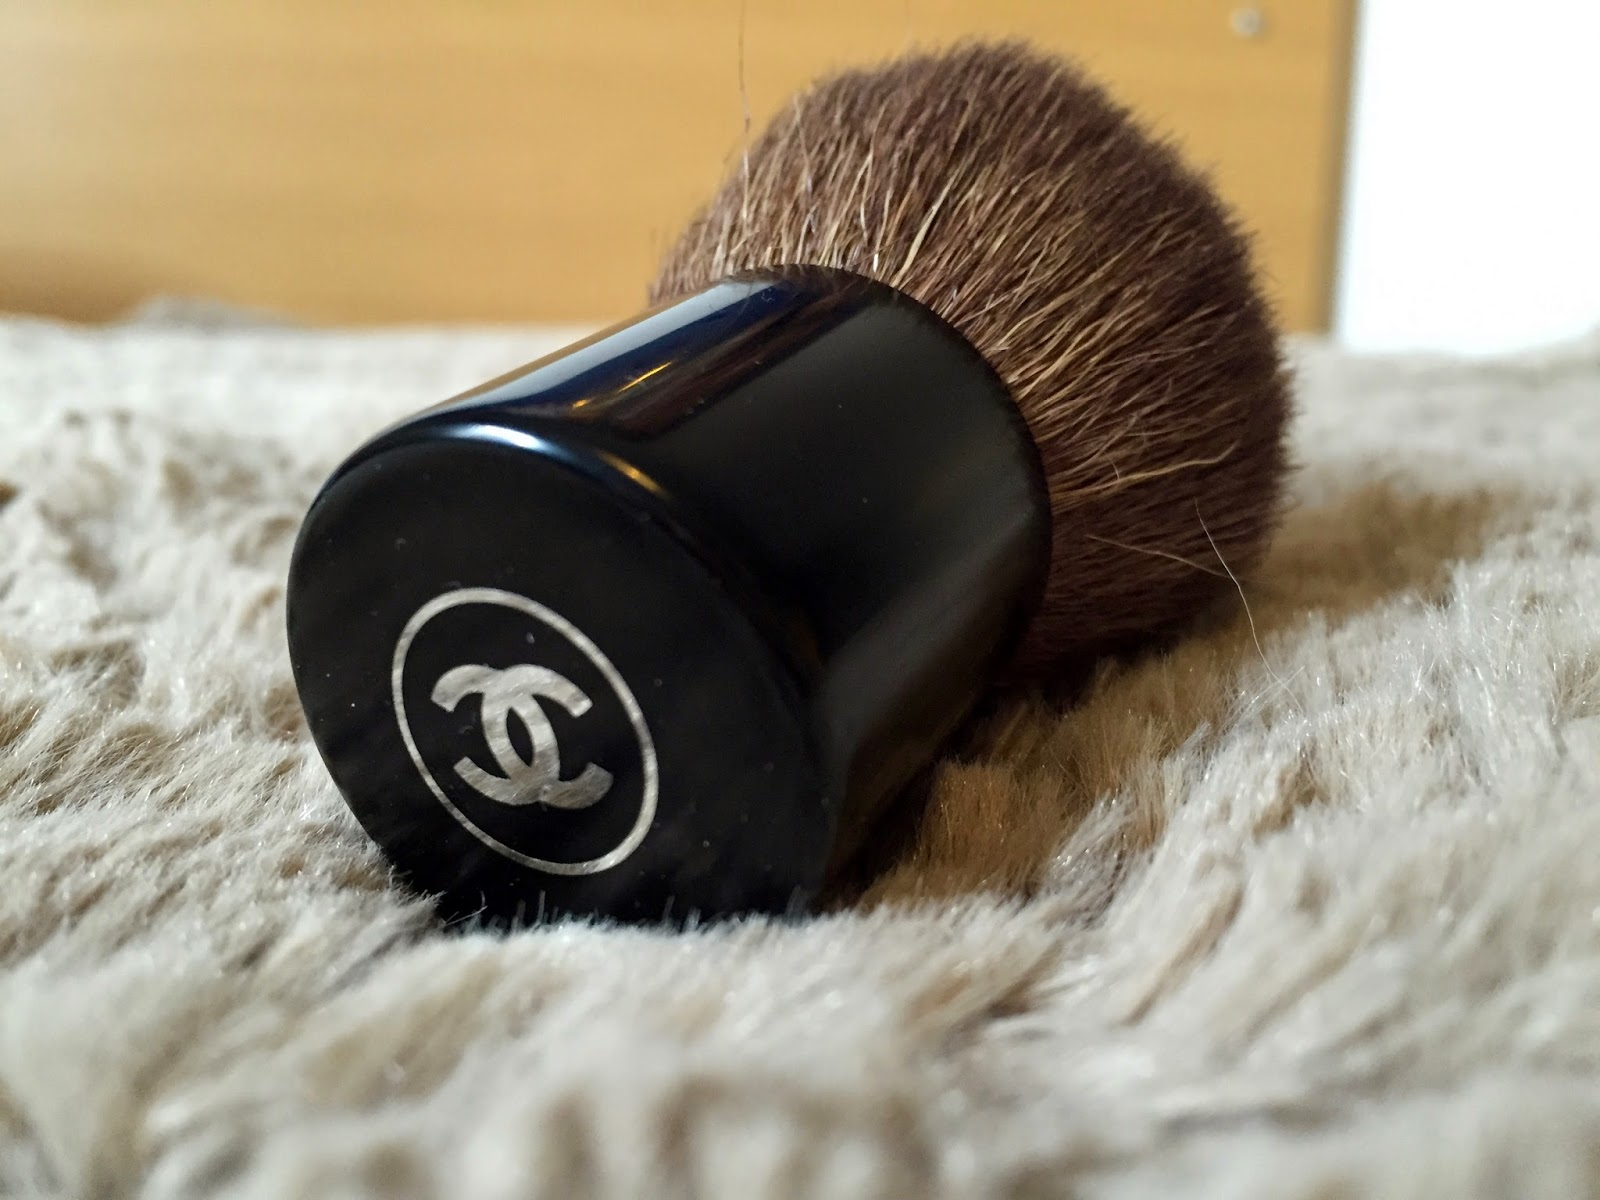 chanel, chanel brush, chanel brush review, chanel touch up review brush, touch up brush review,